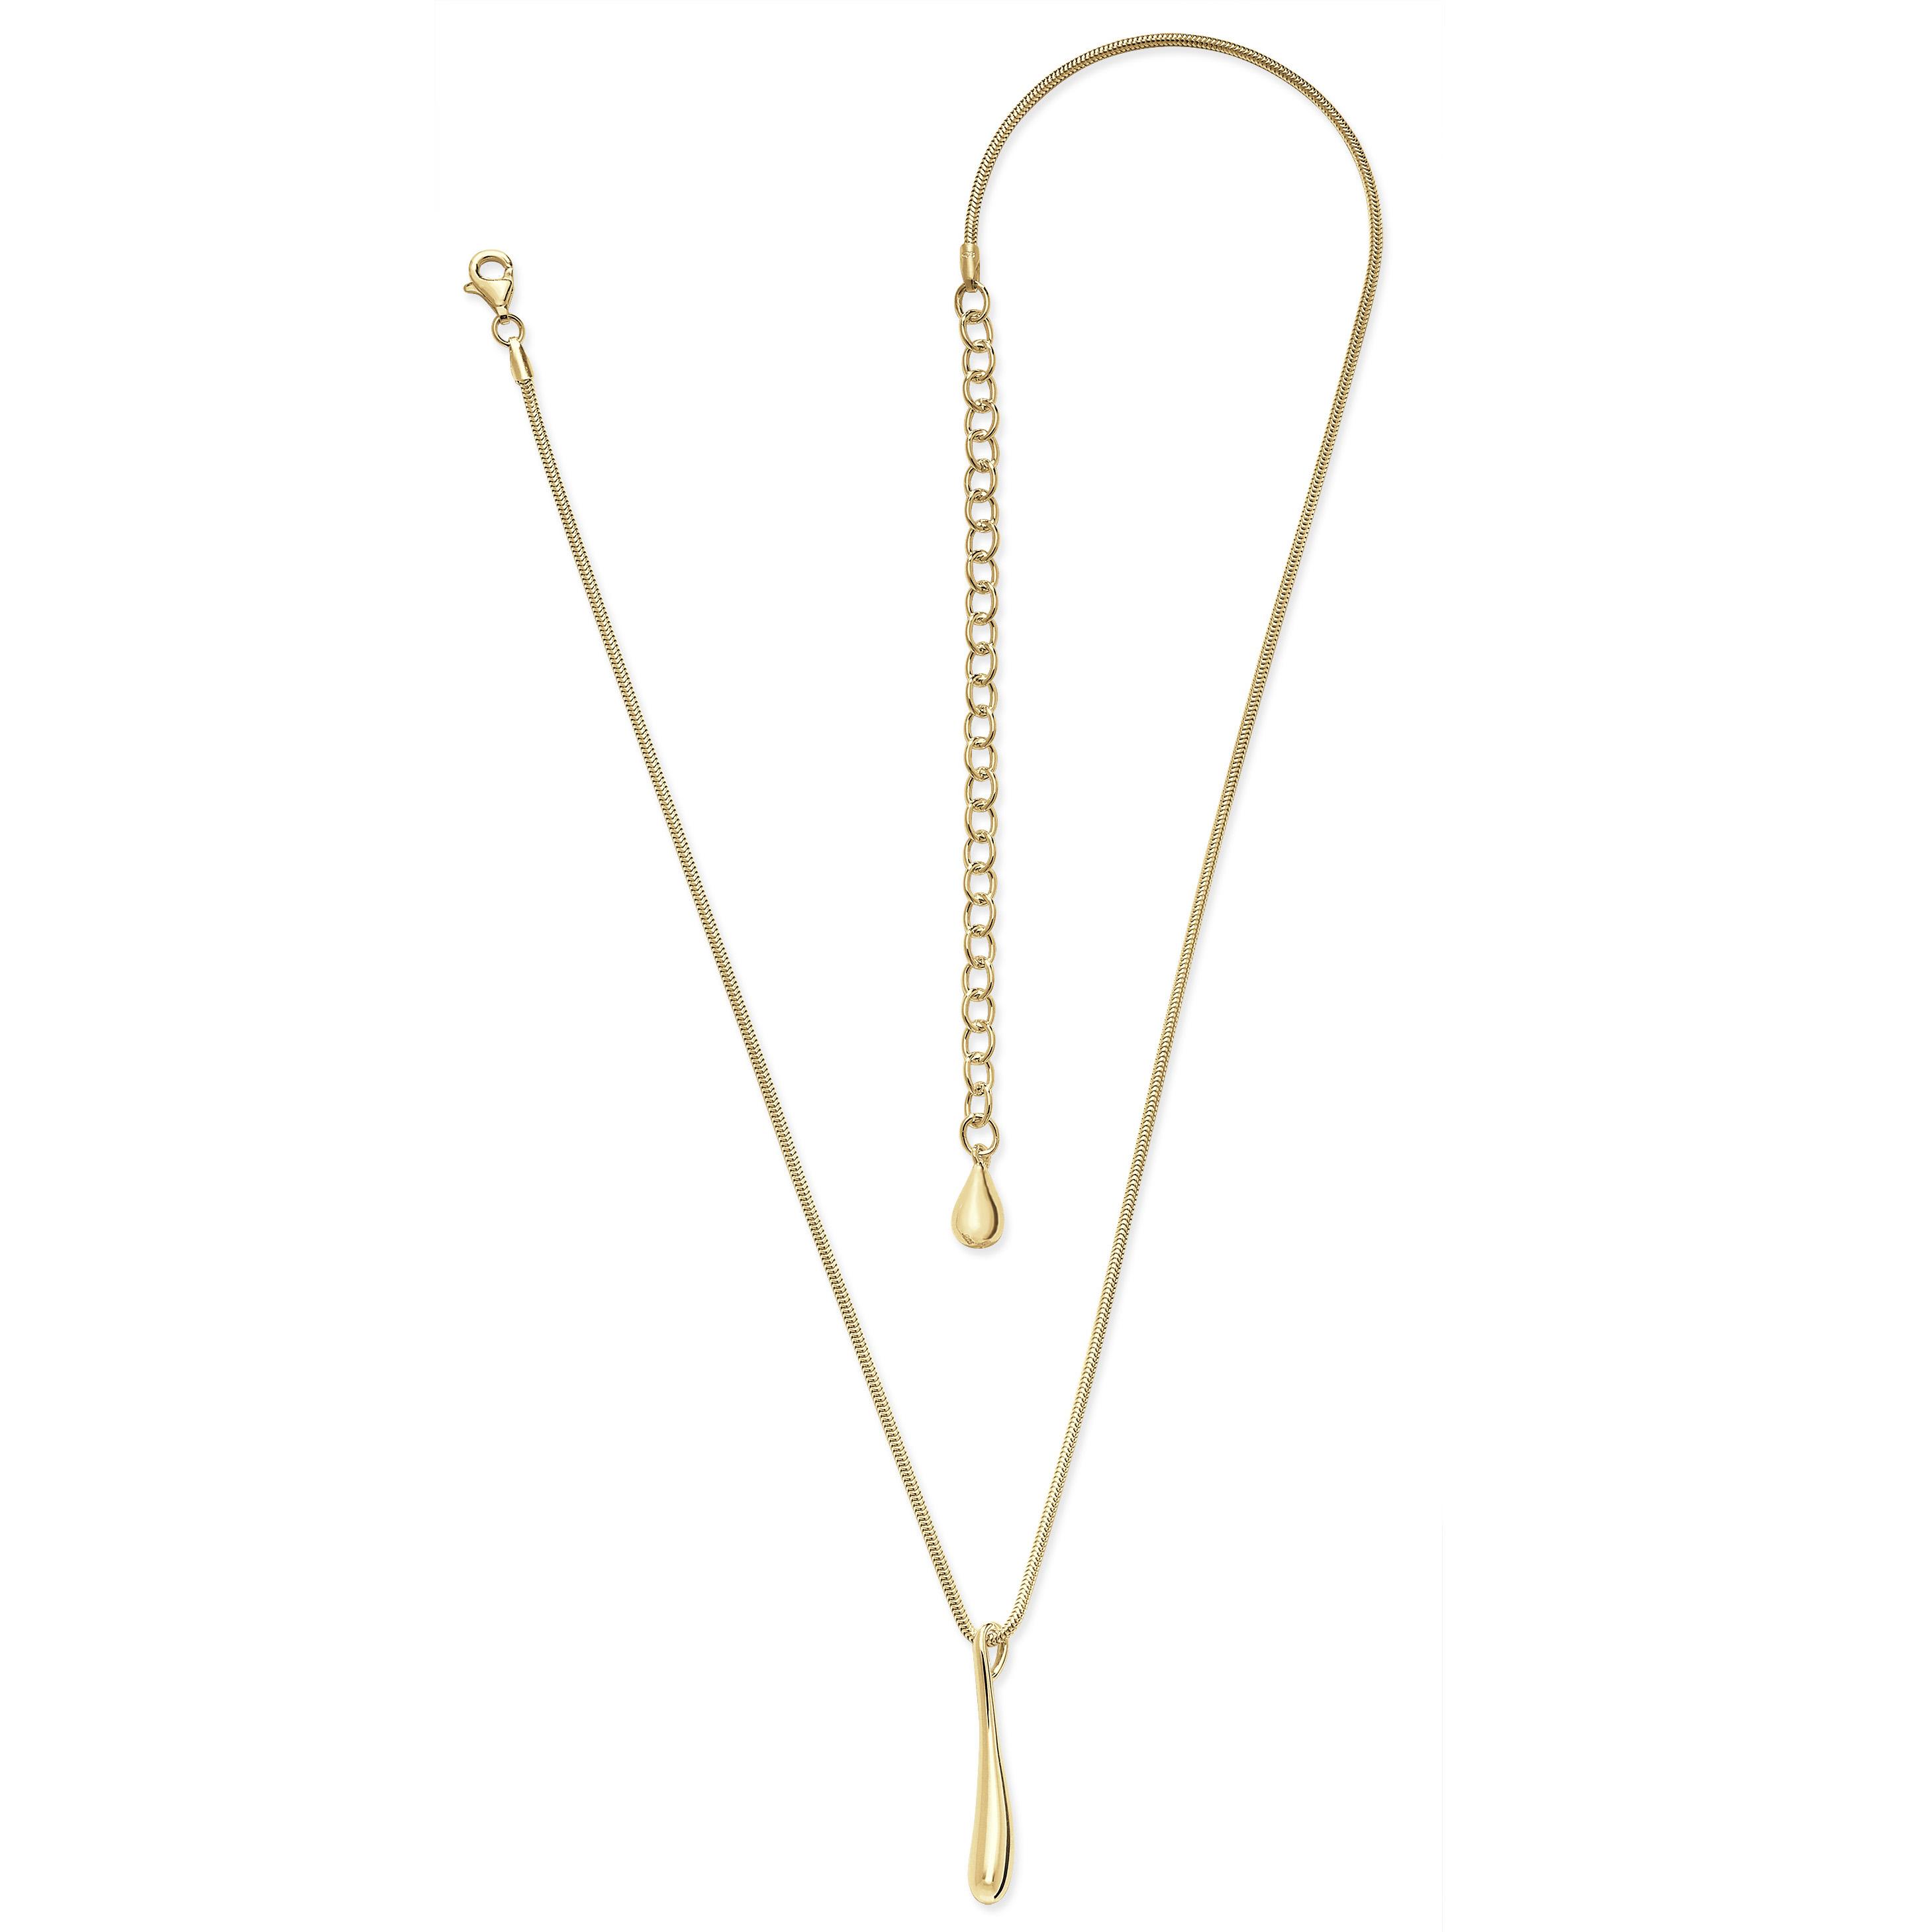 Lucy Q Gold Vermeil Single Drip Necklace